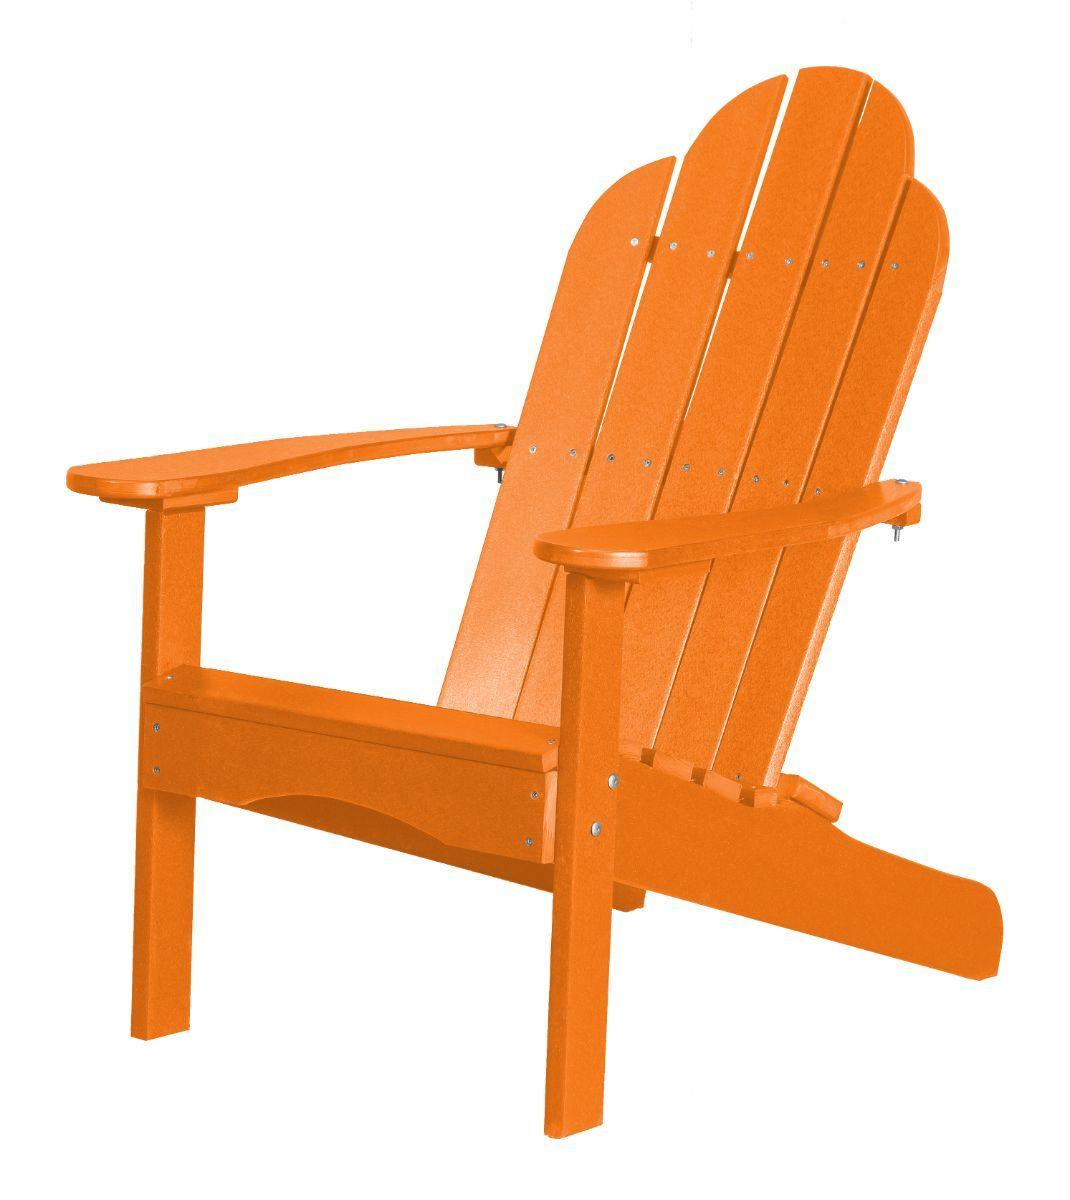 Bright Orange Odessa Adirondack Chair